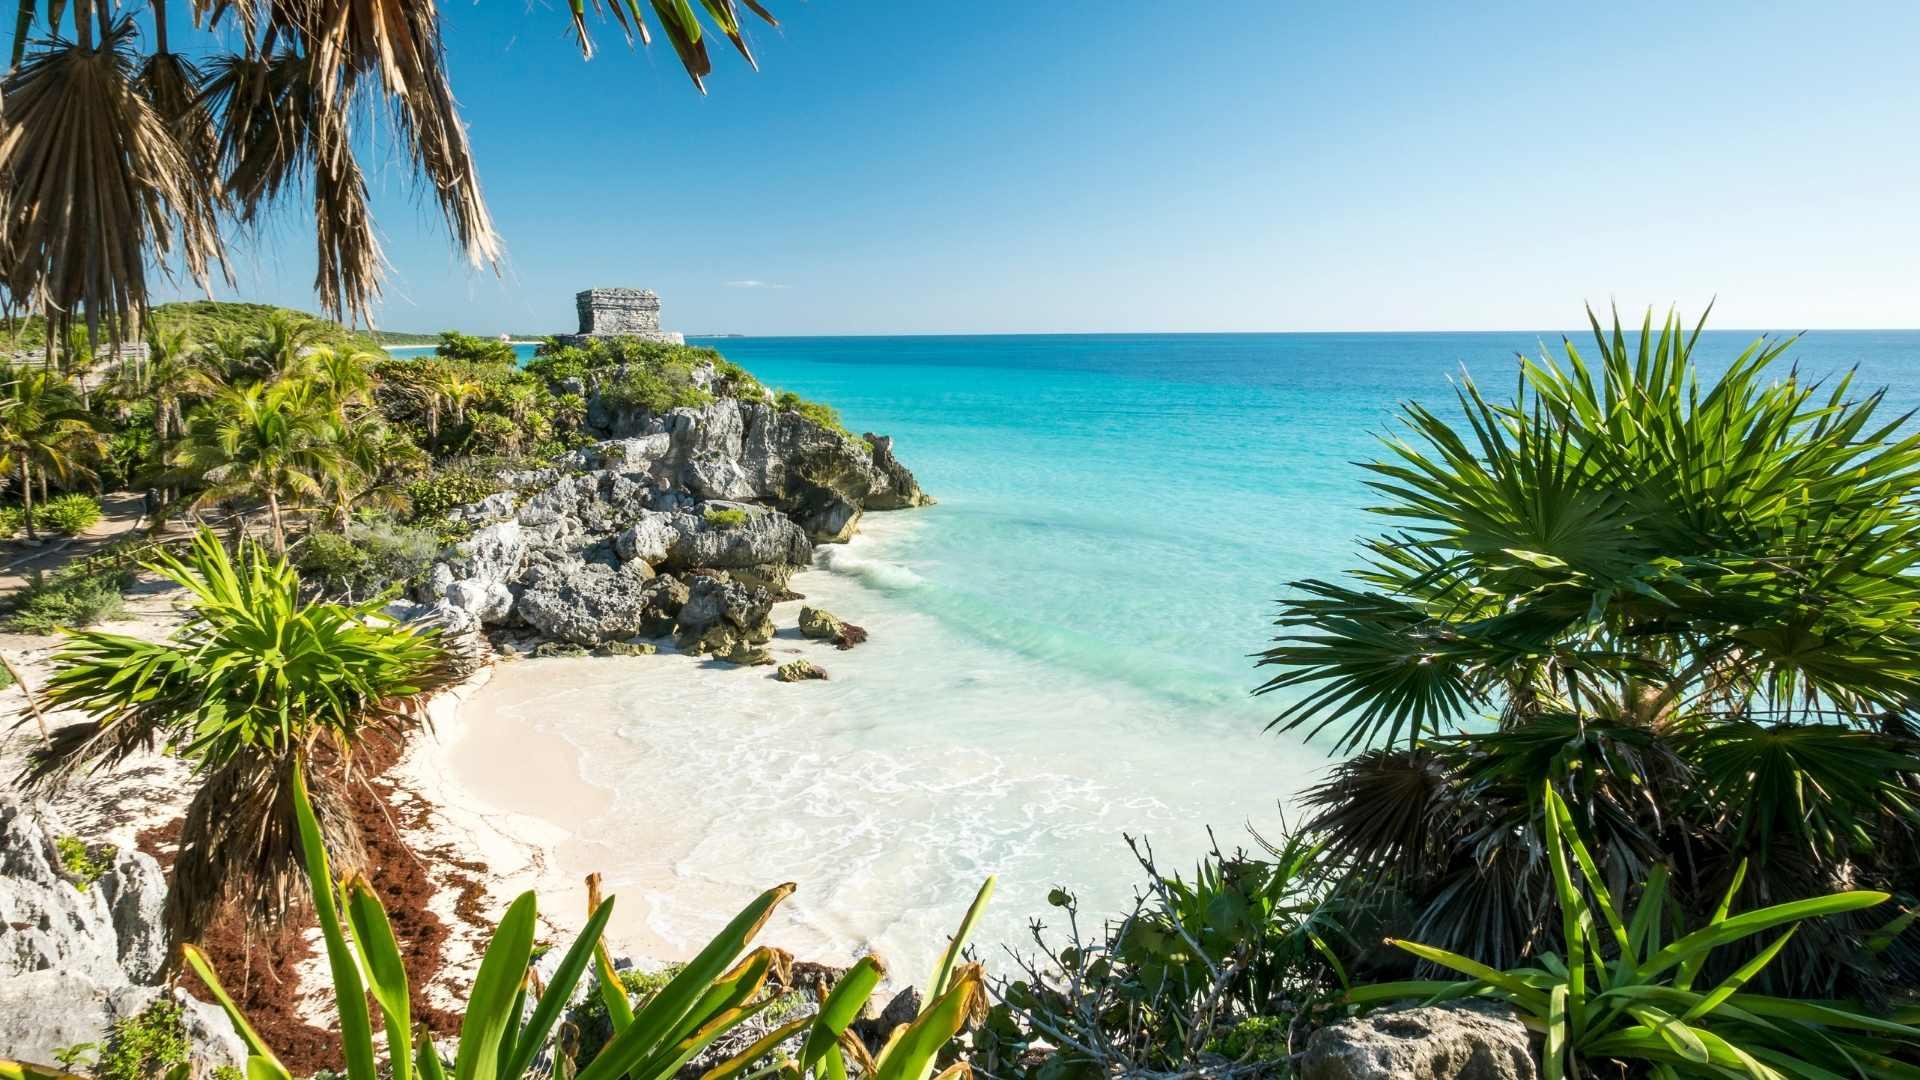 https://www.elliestraveltips.com/beautiful-overwater-bungalows-caribbean/